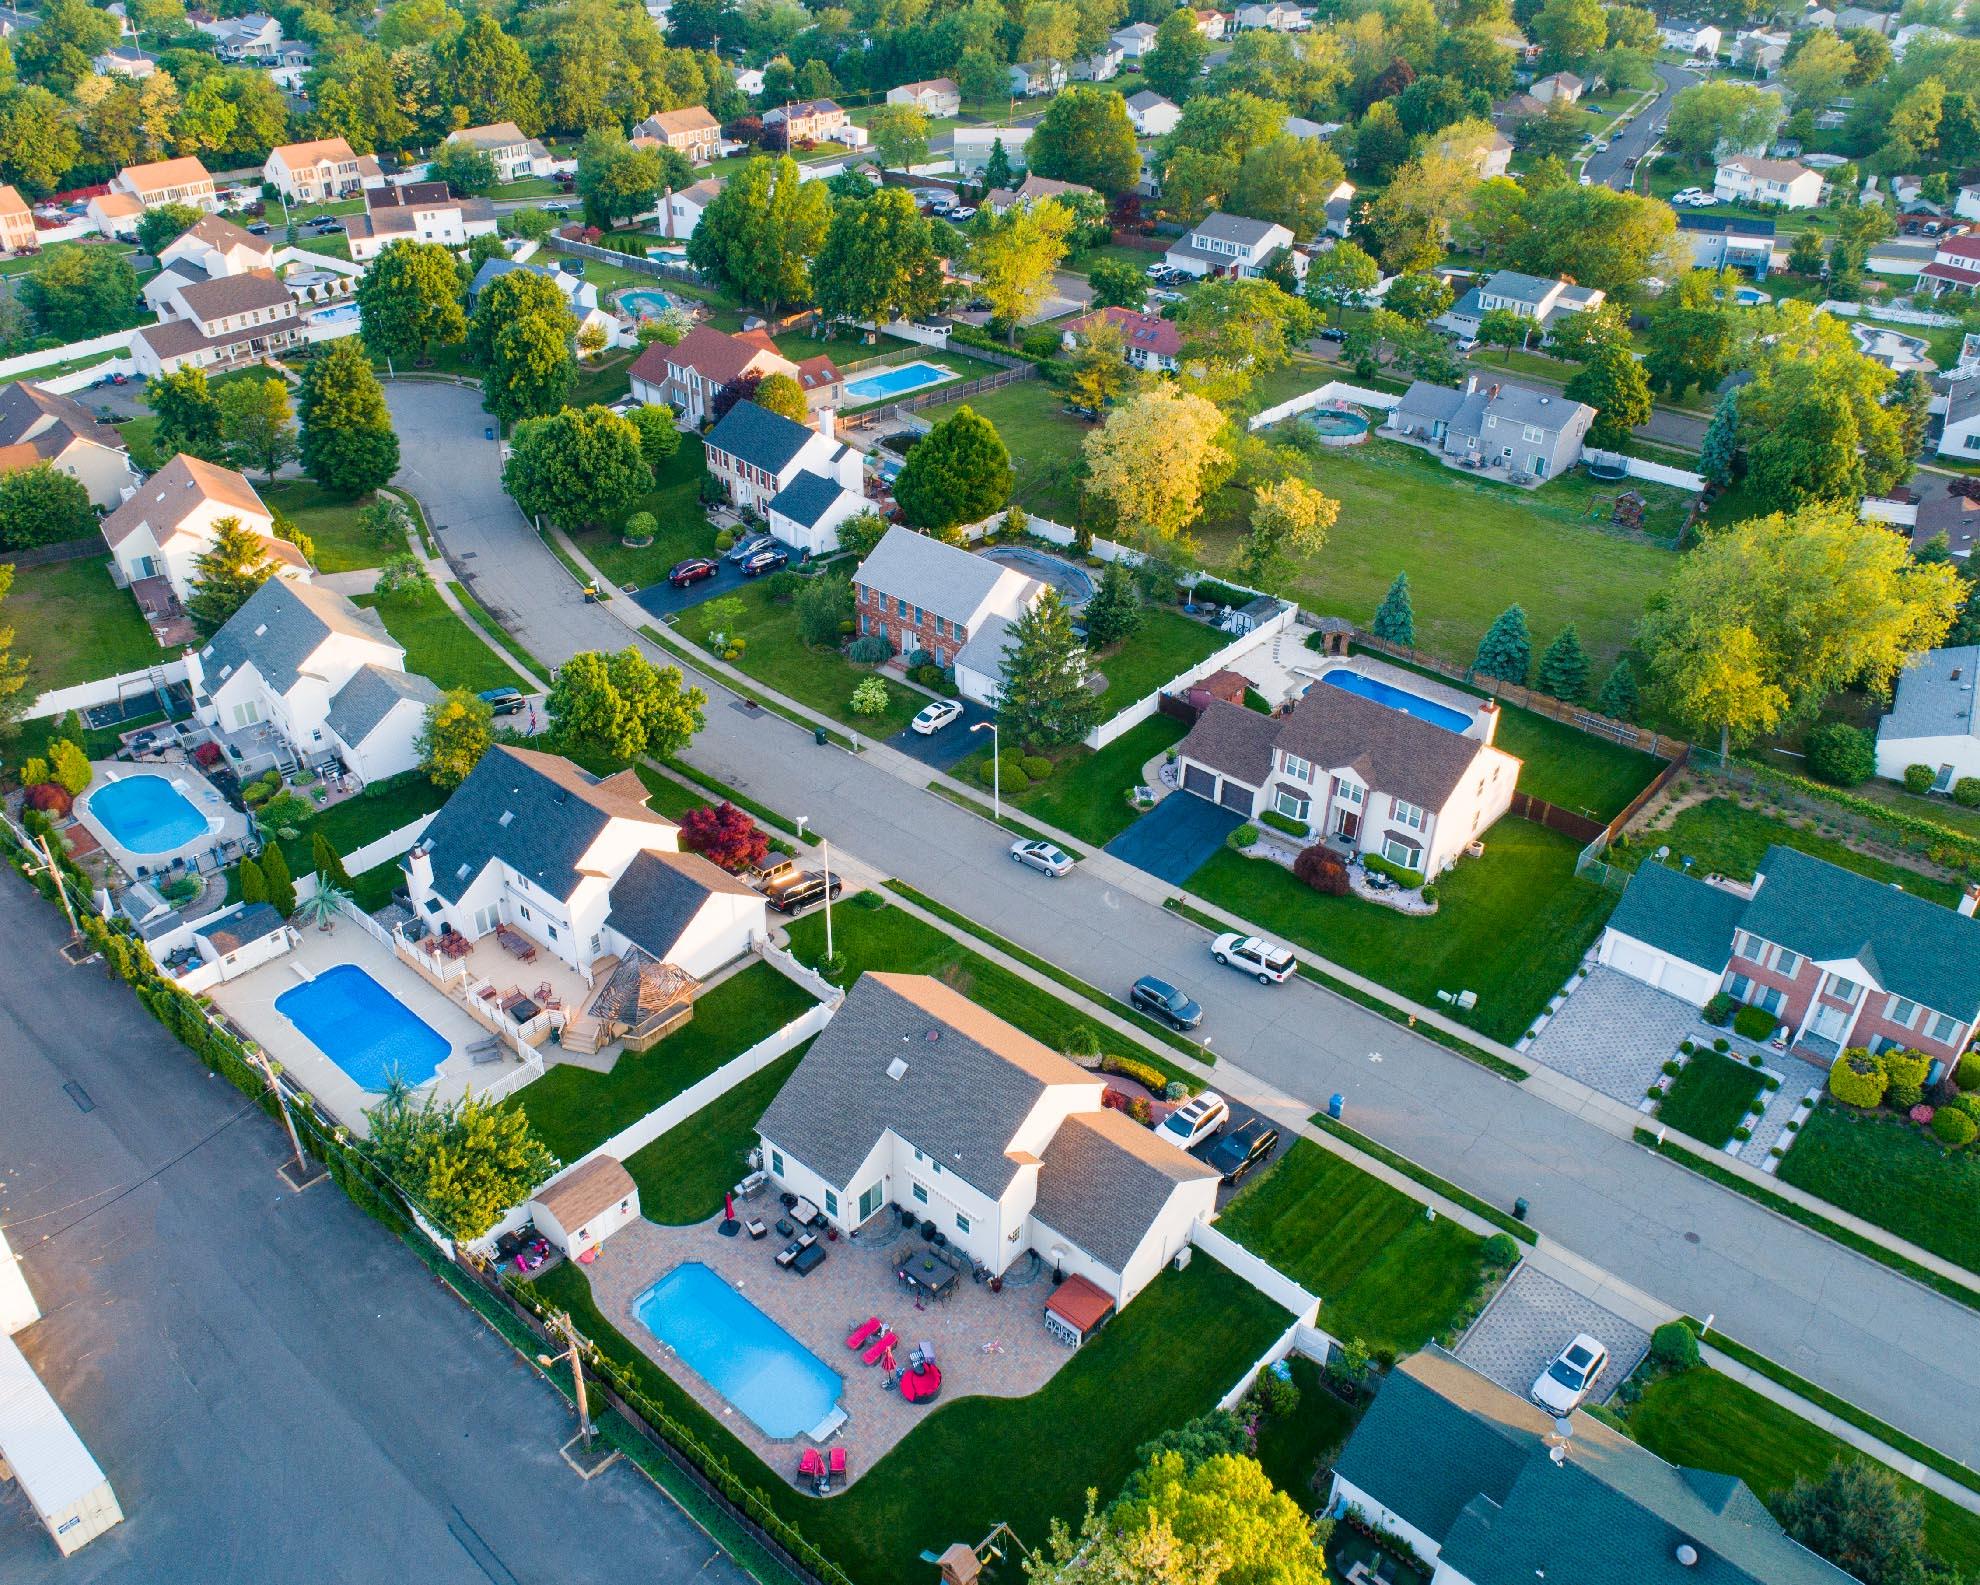 Drone Photograph of Hazlet NJ Neighborhood